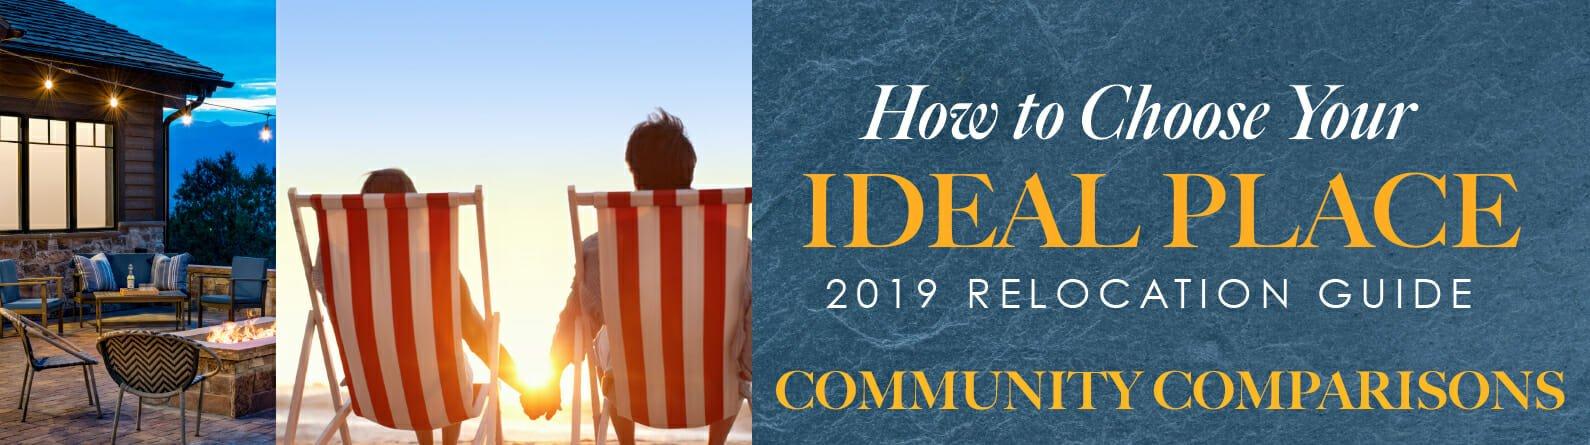 Community Comparison 2019